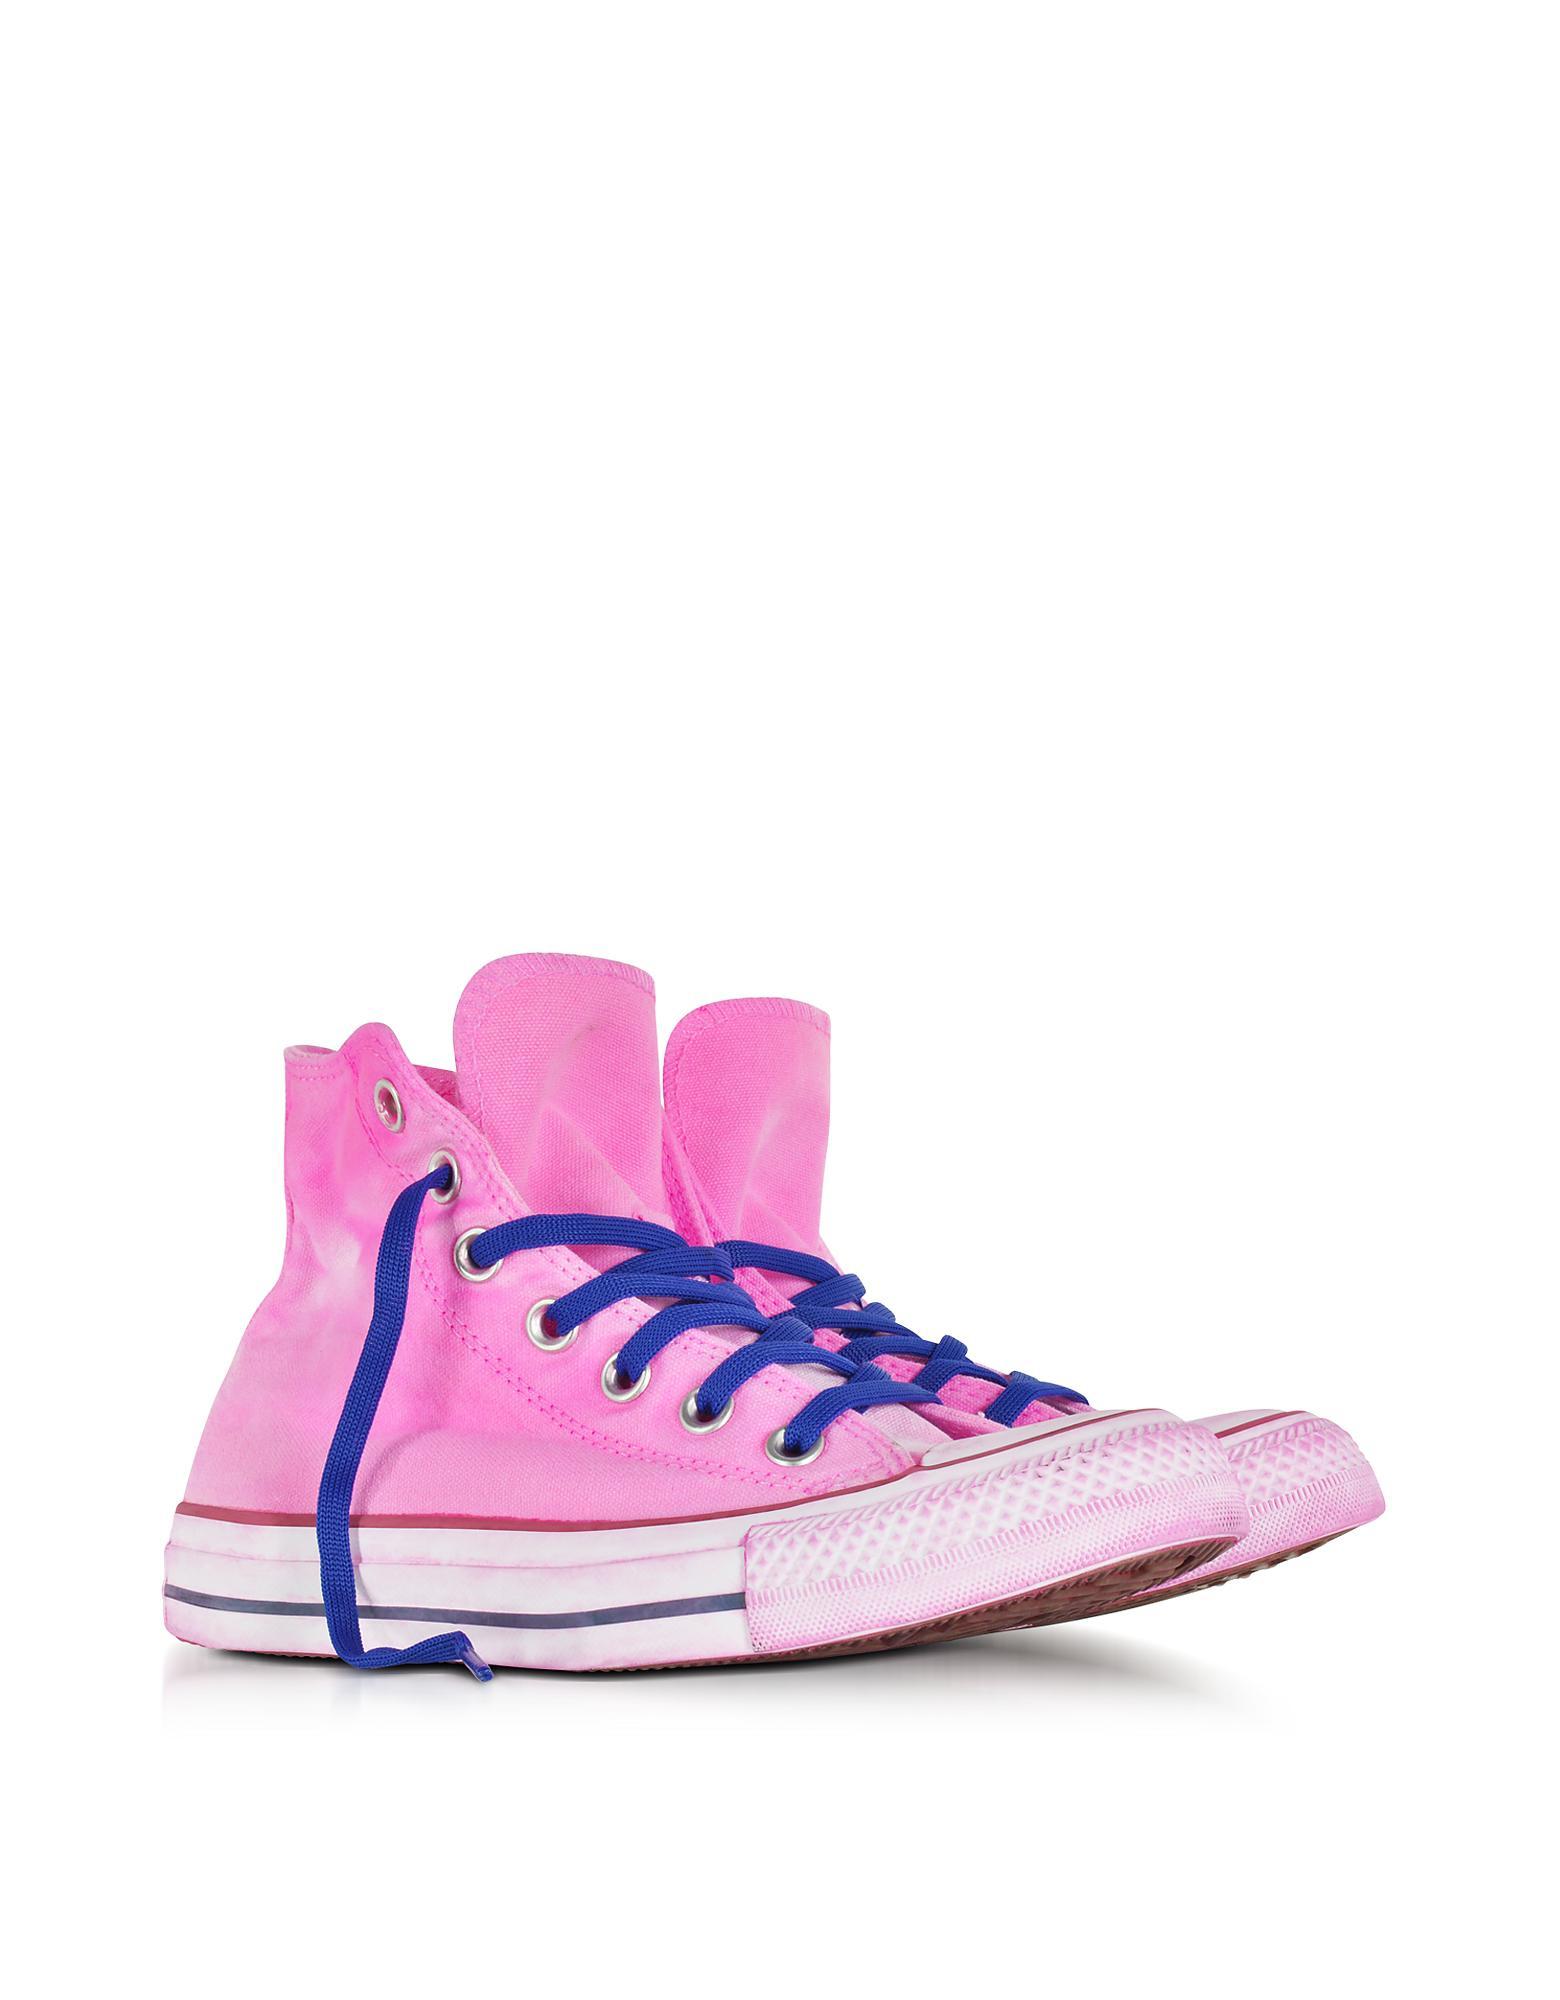 2b83e056ea30 Converse Chuck Taylor All Star Hi Neon Fuchsia Canvas Ltd Sneakers ...